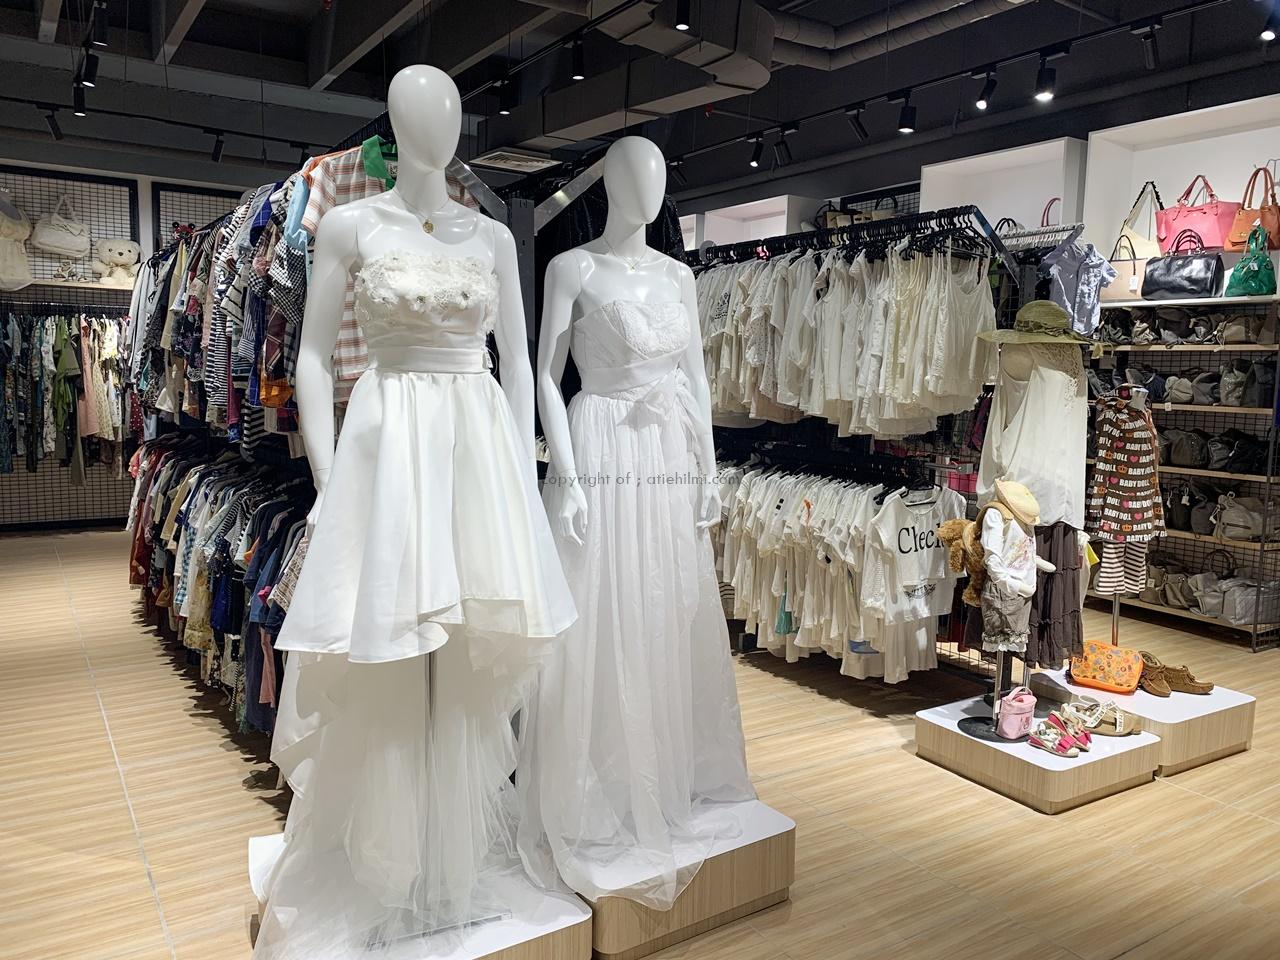 Kedai Baju Bundle Subang Jaya